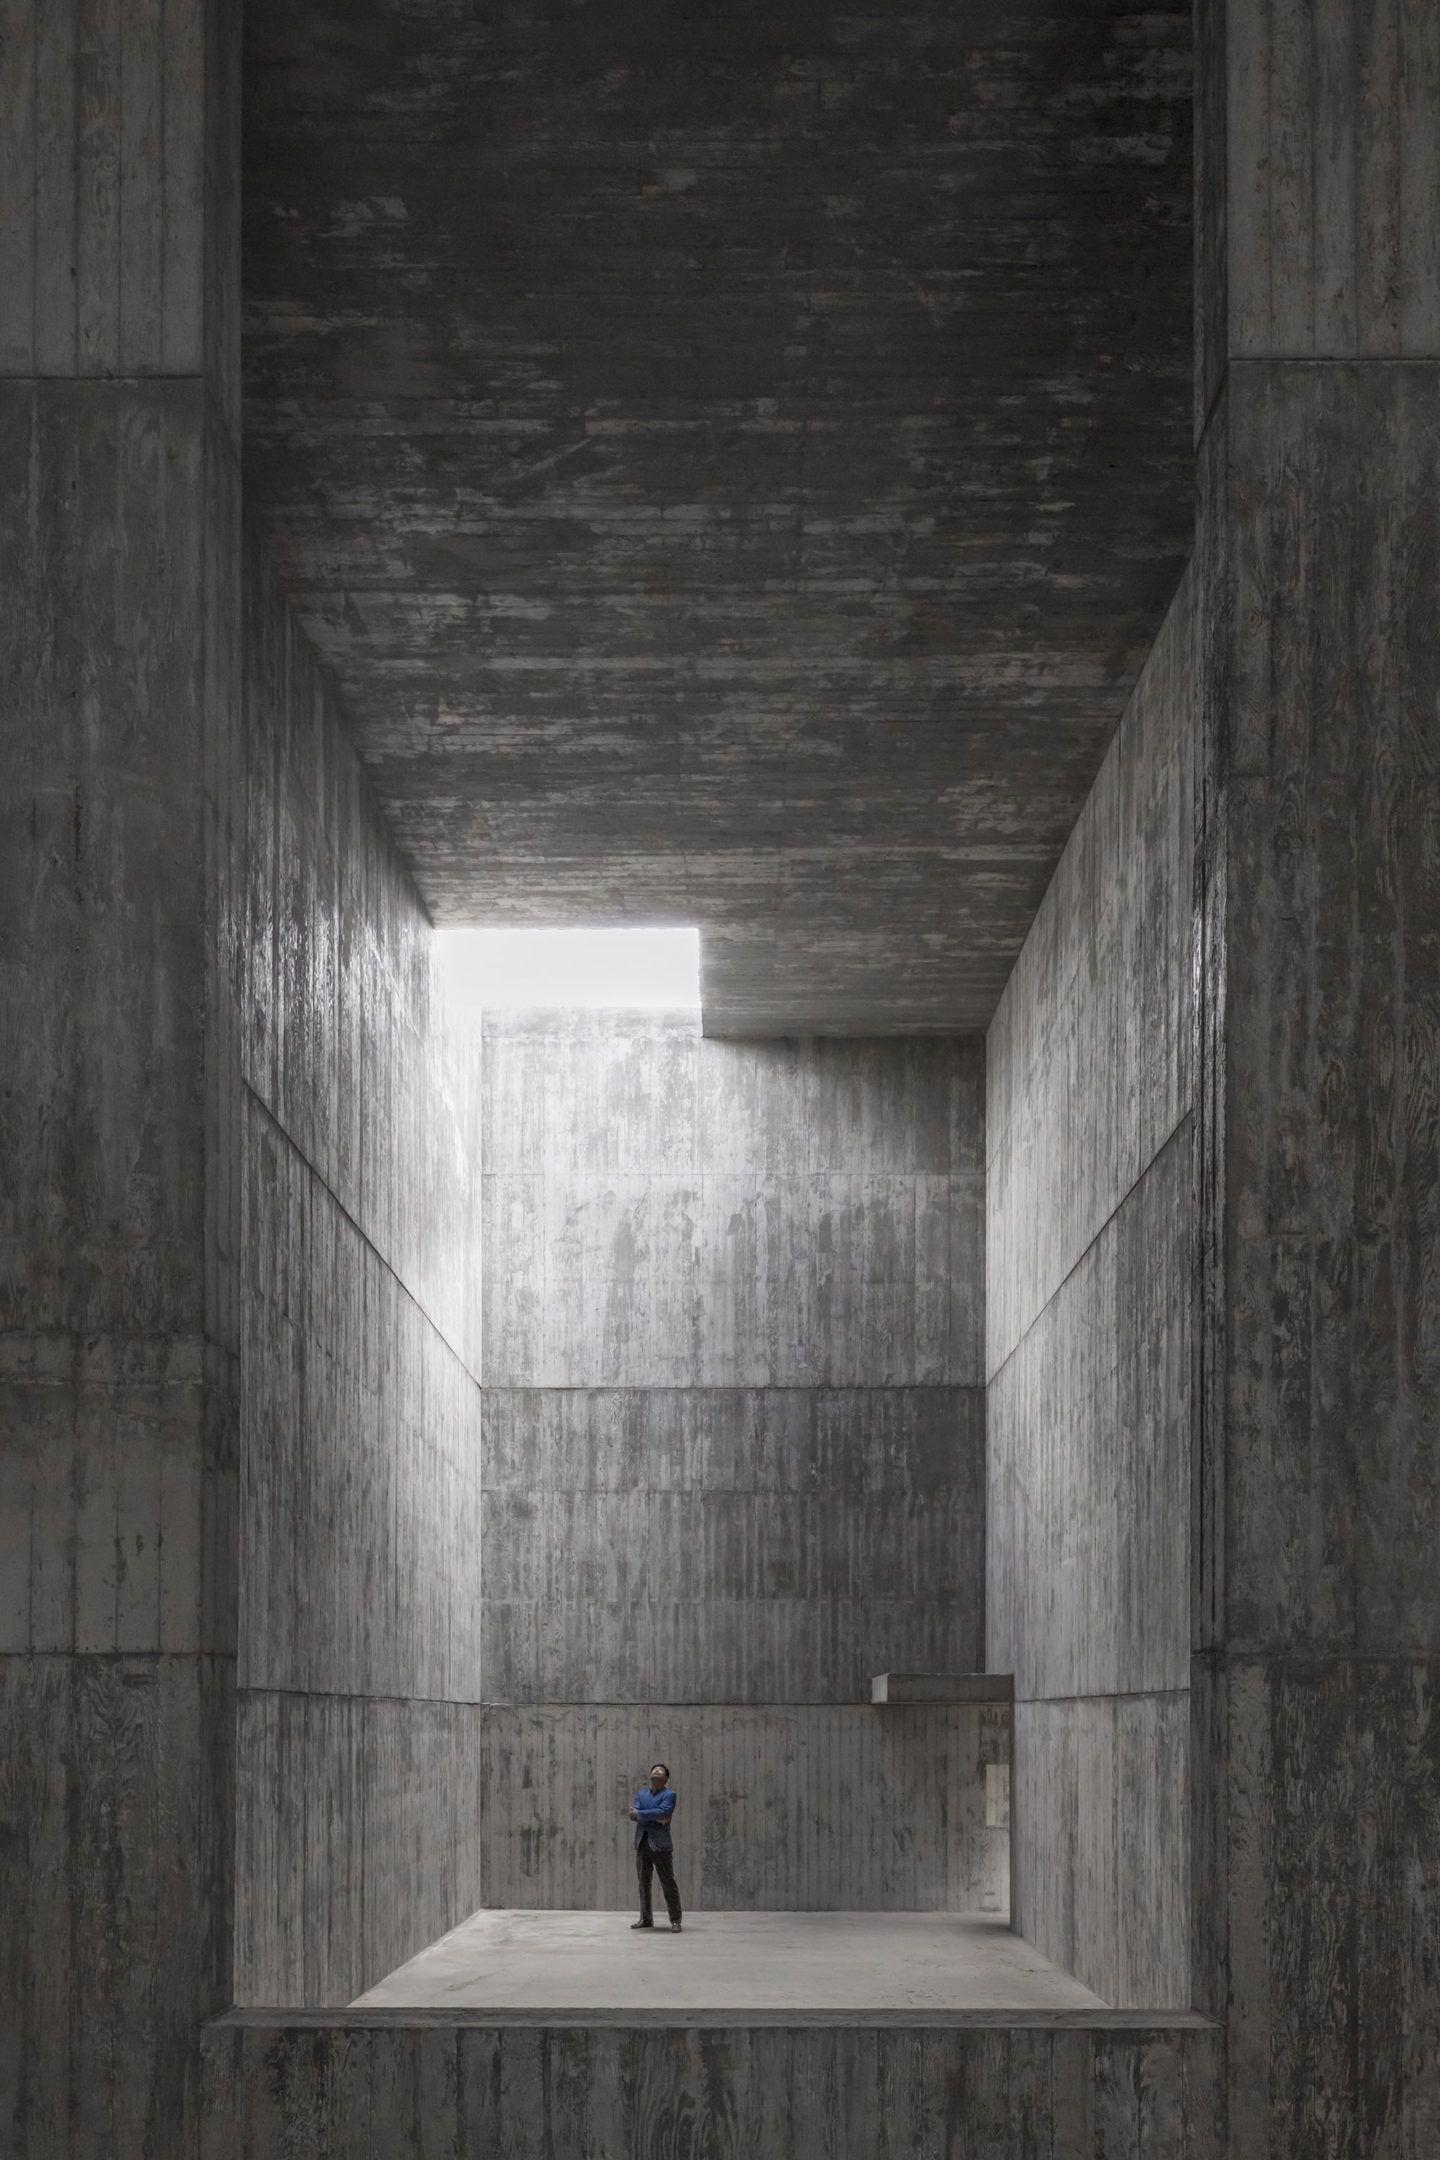 IGNANT-Architecture-Alvaro-Siza-Carlos-Castanheira-Art-Pavilion-Photographs-13